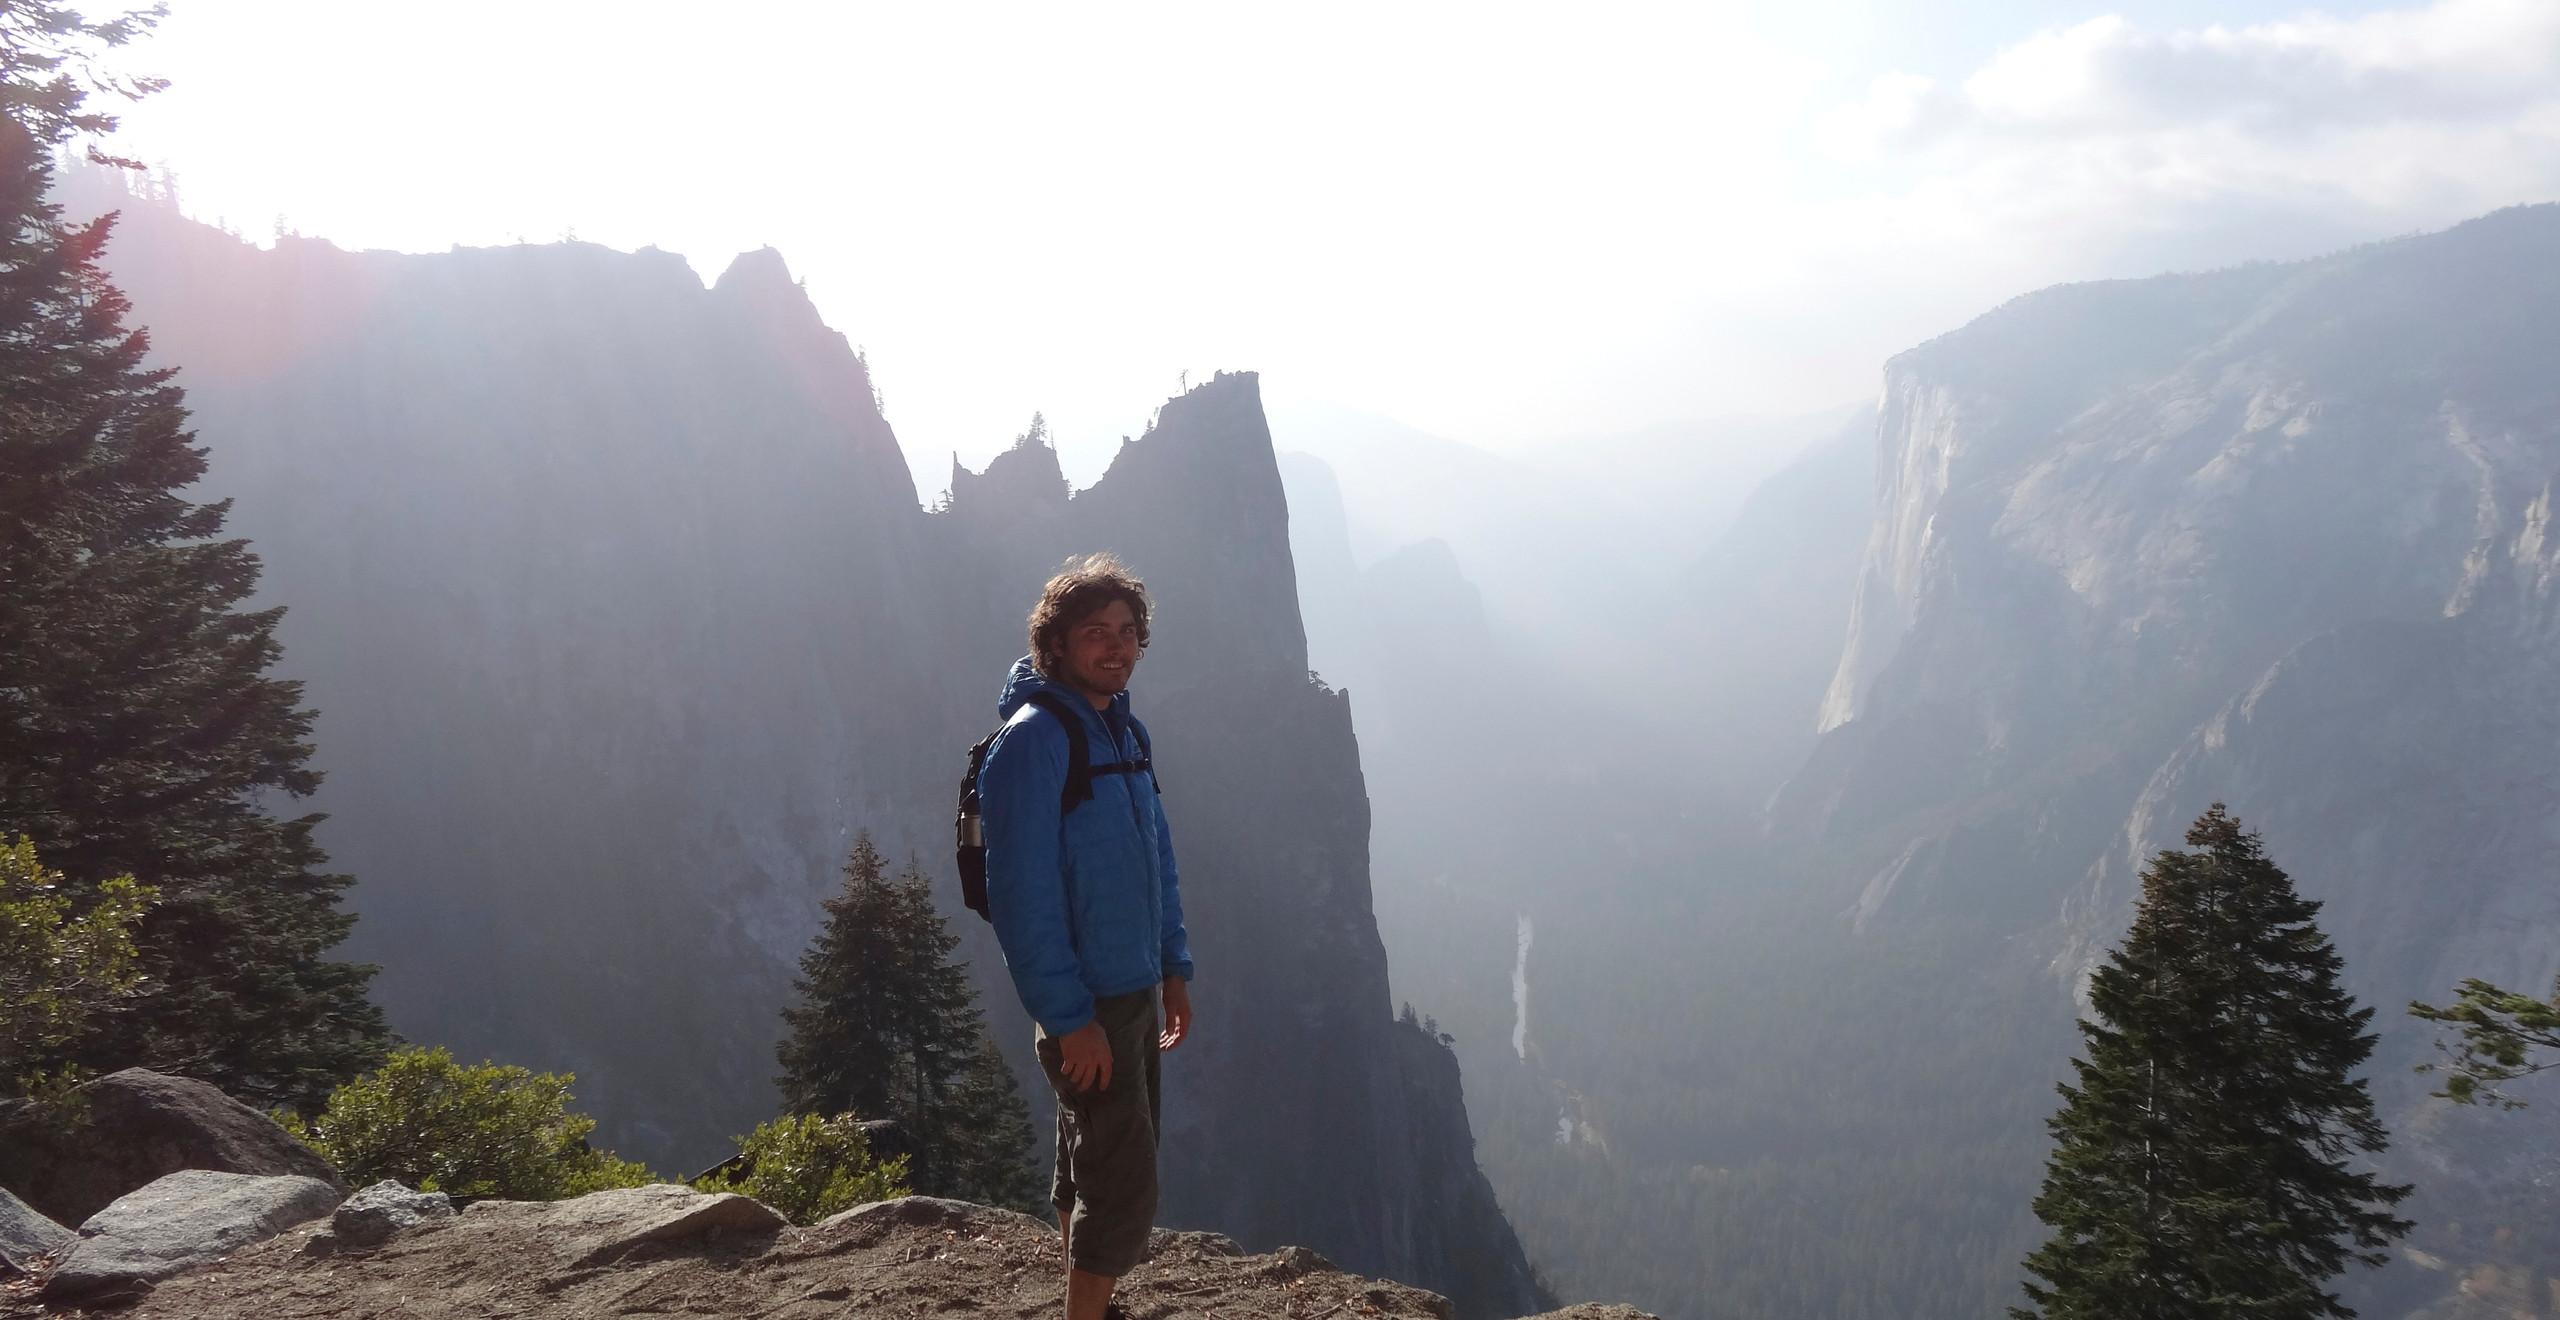 Yosemite was a Highlight